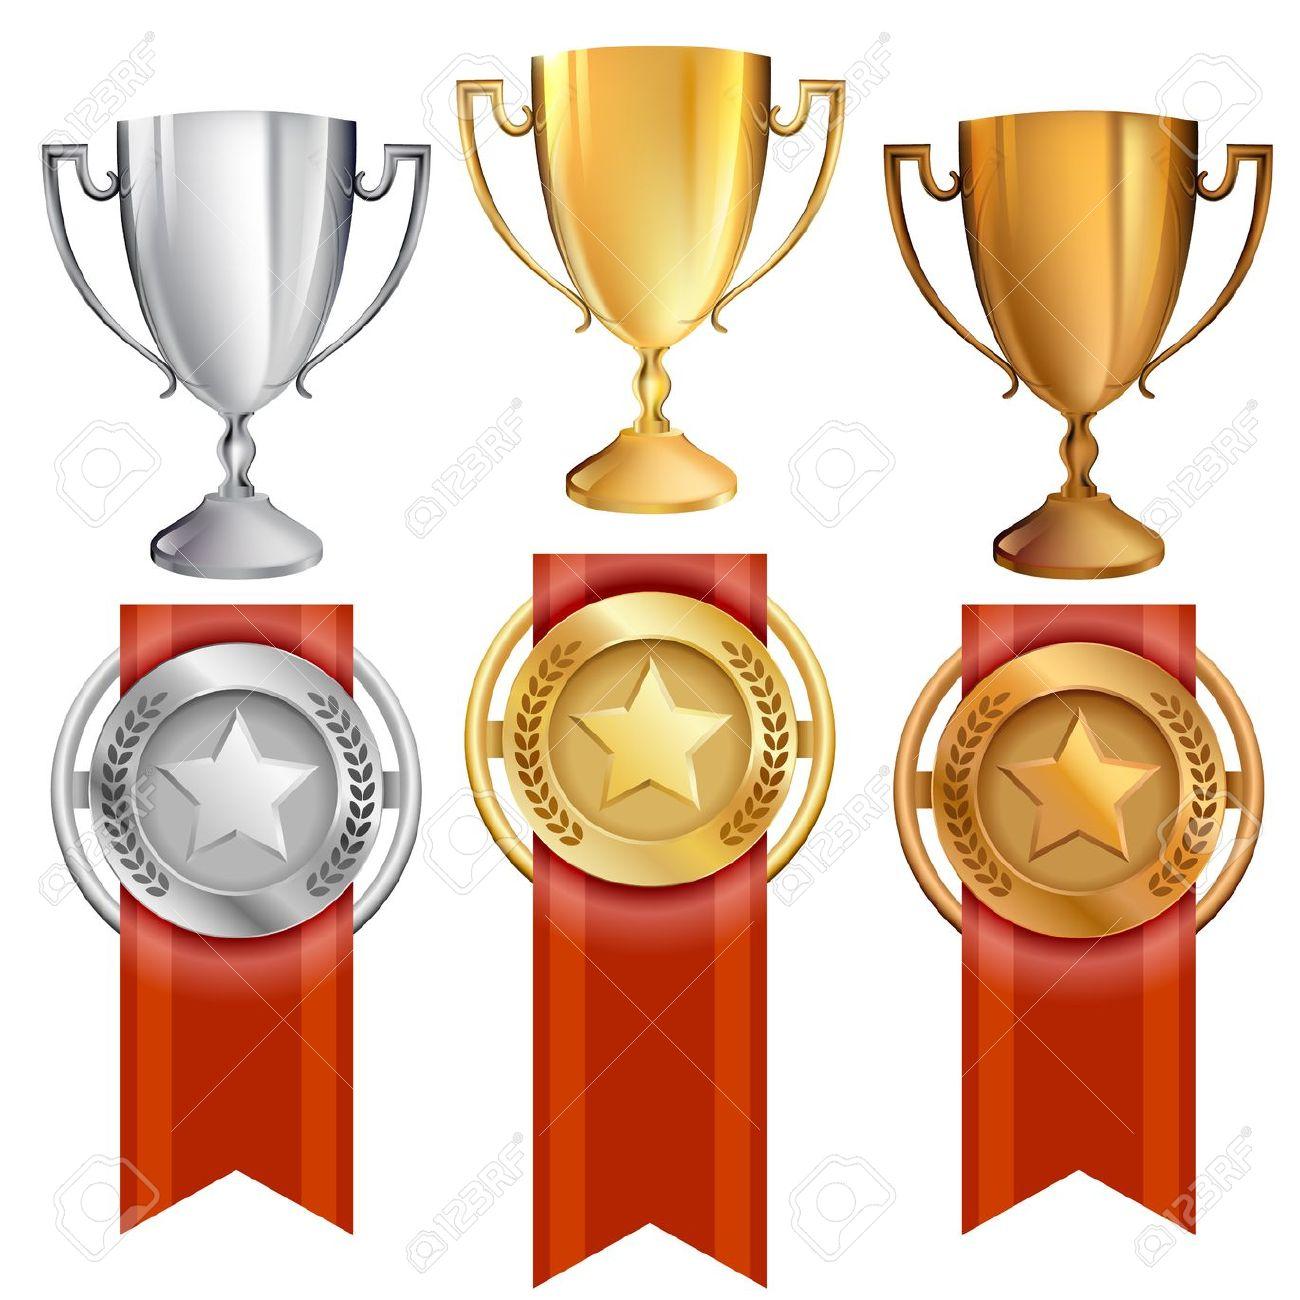 Trophy gold medal . Awards clipart bronze